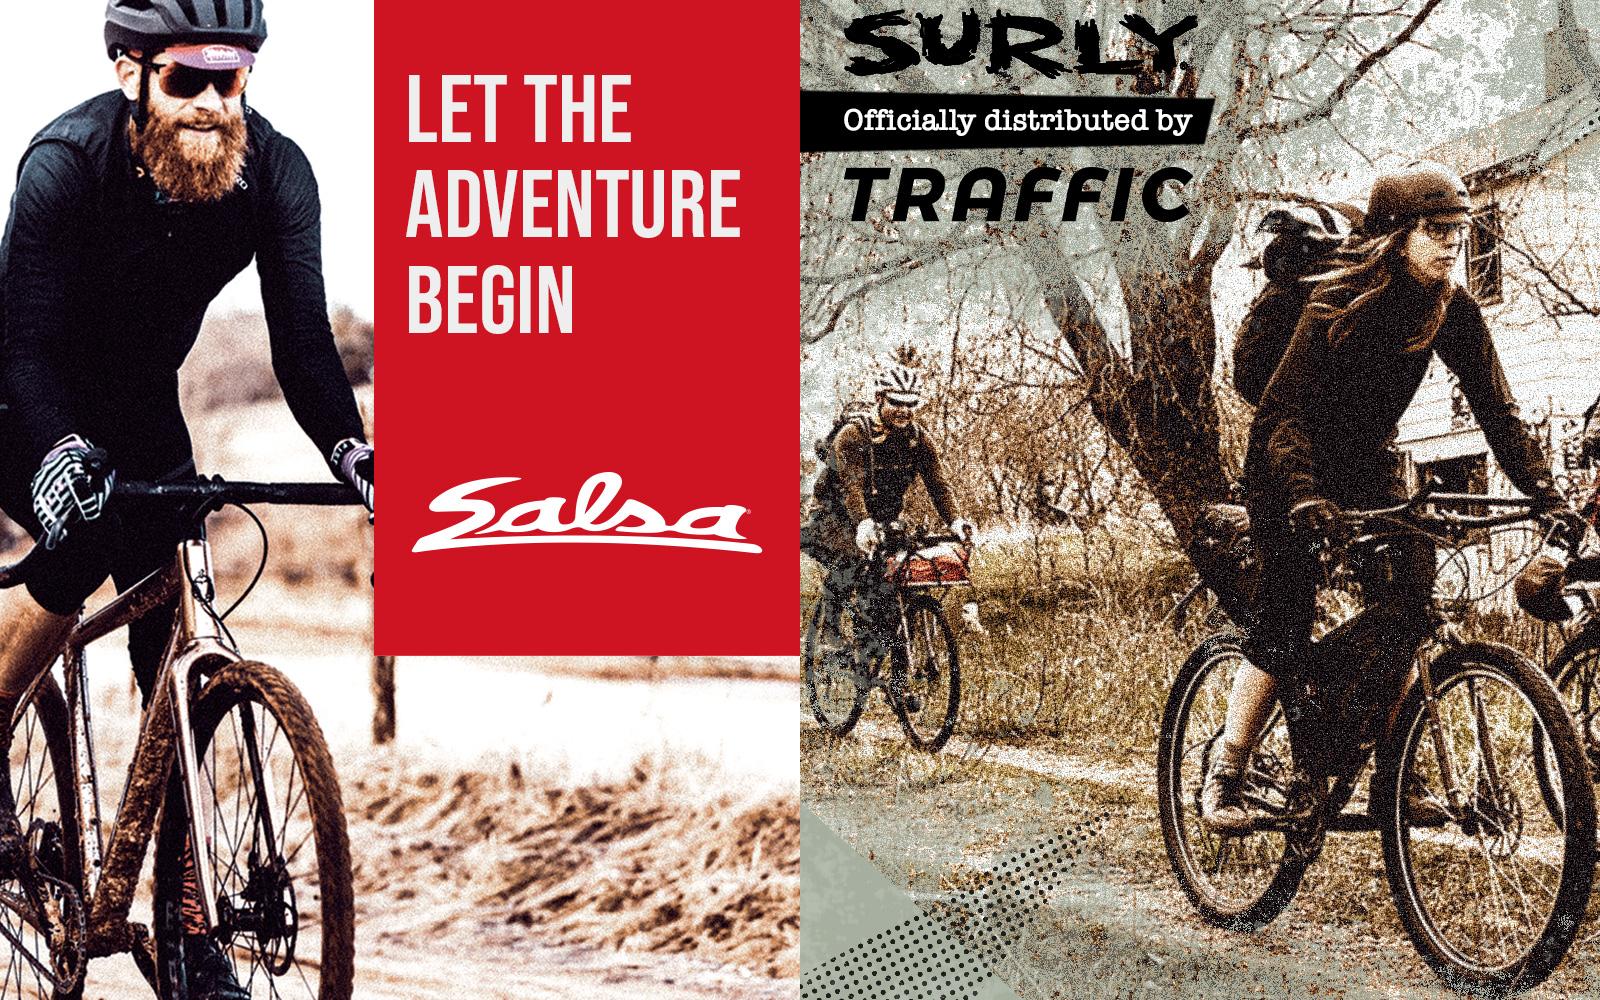 Traffic Distribution Surly Salsa